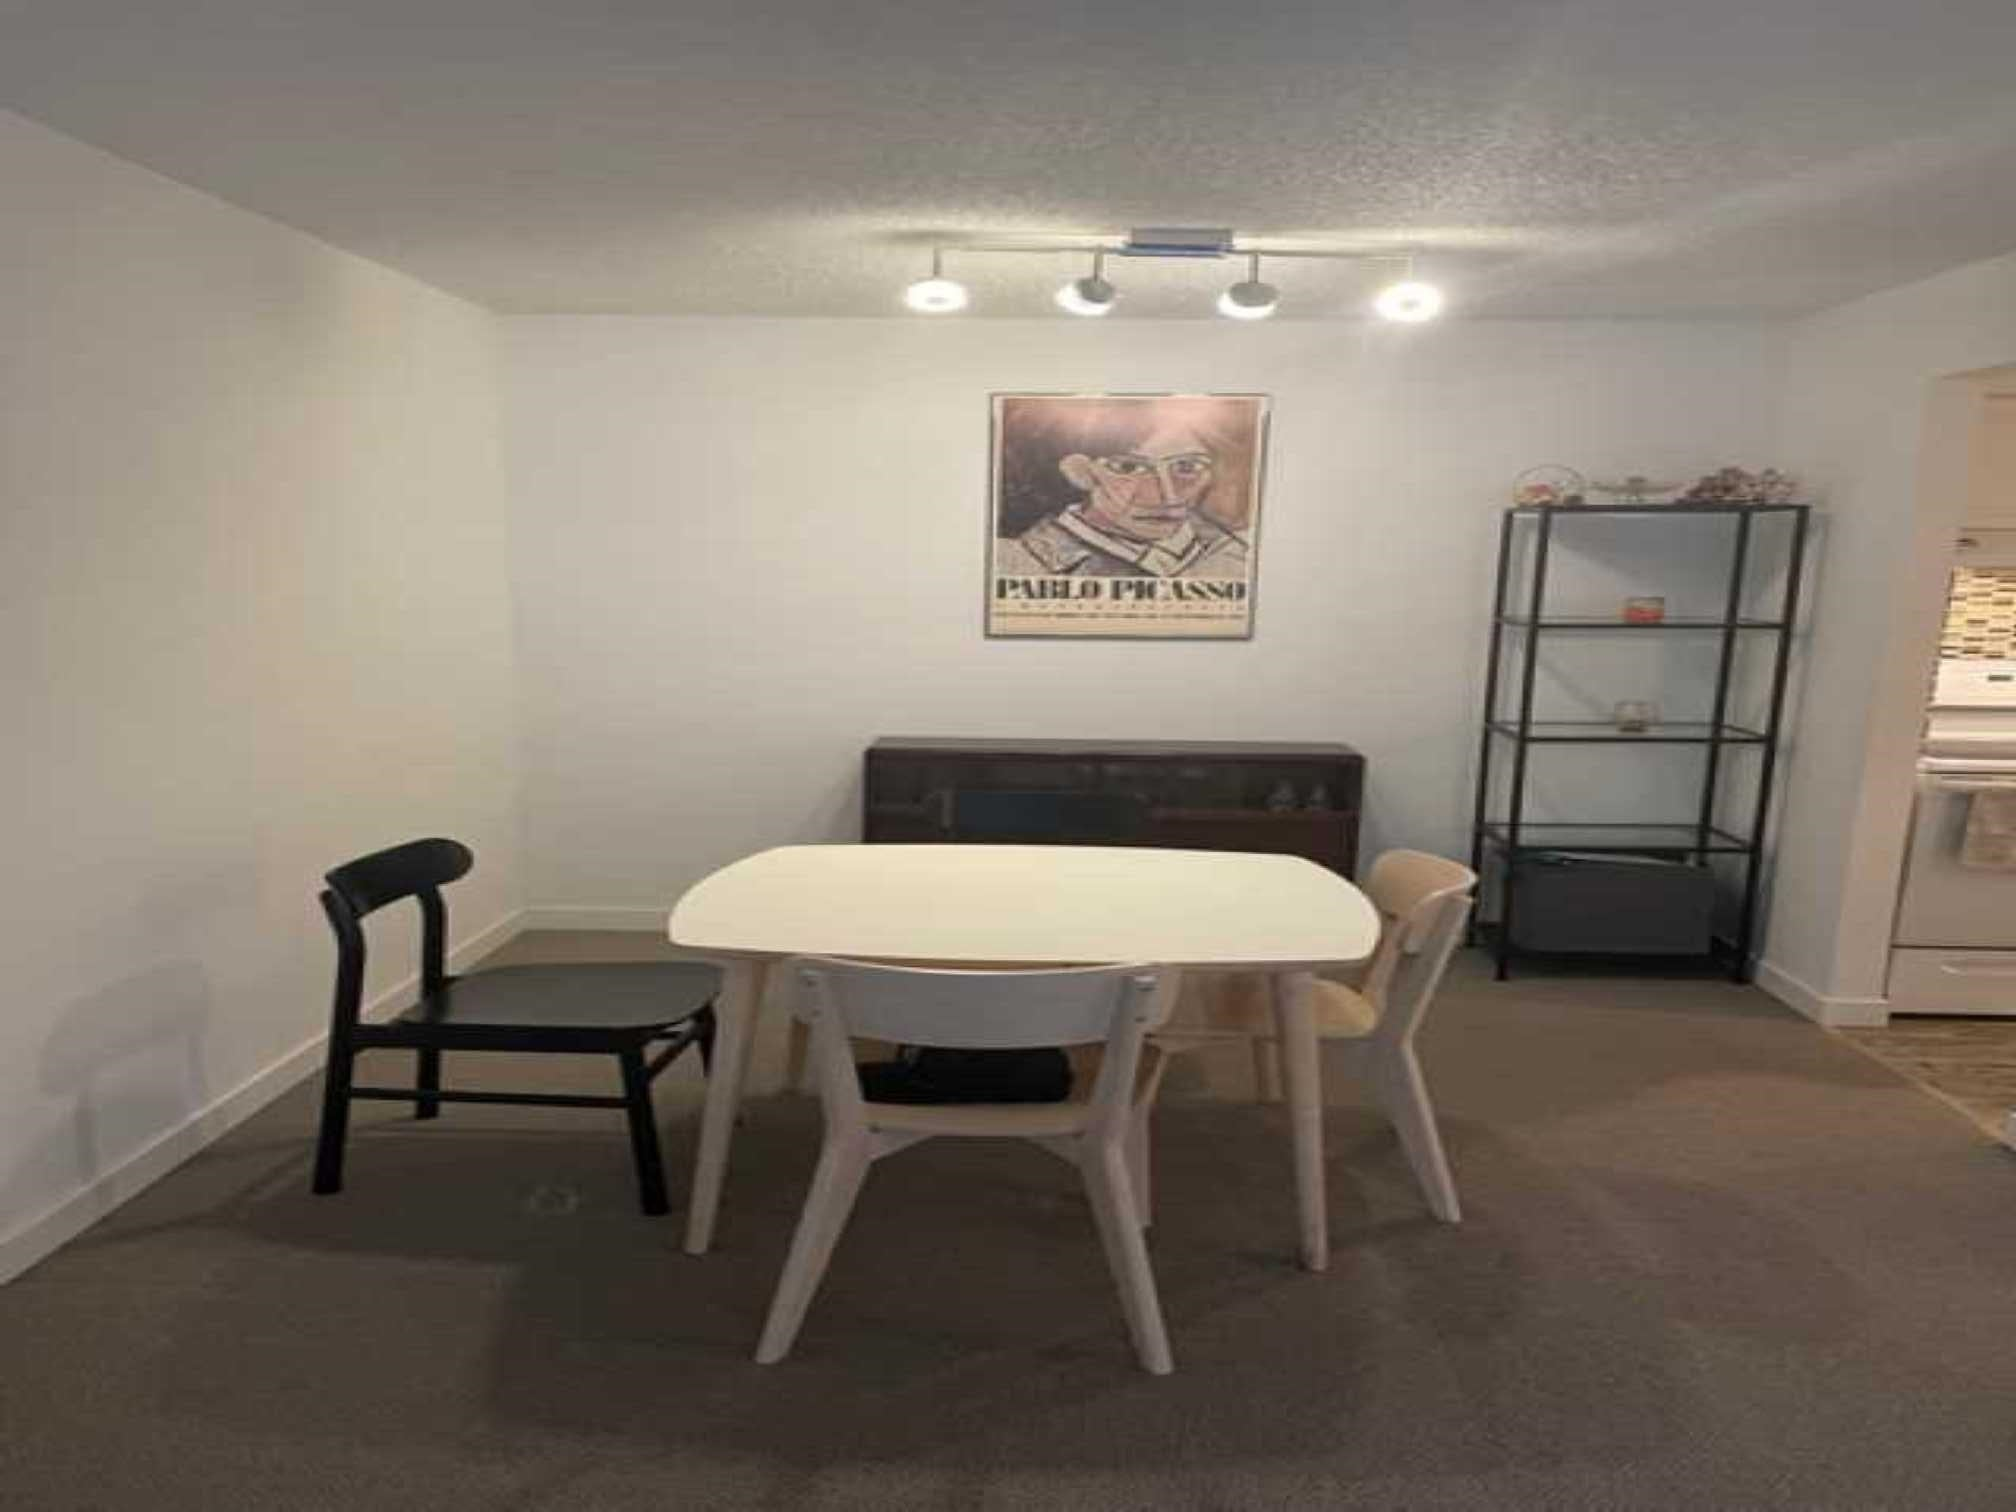 305 2004 FULLERTON AVENUE - Pemberton NV Apartment/Condo for sale, 2 Bedrooms (R2621764) - #13